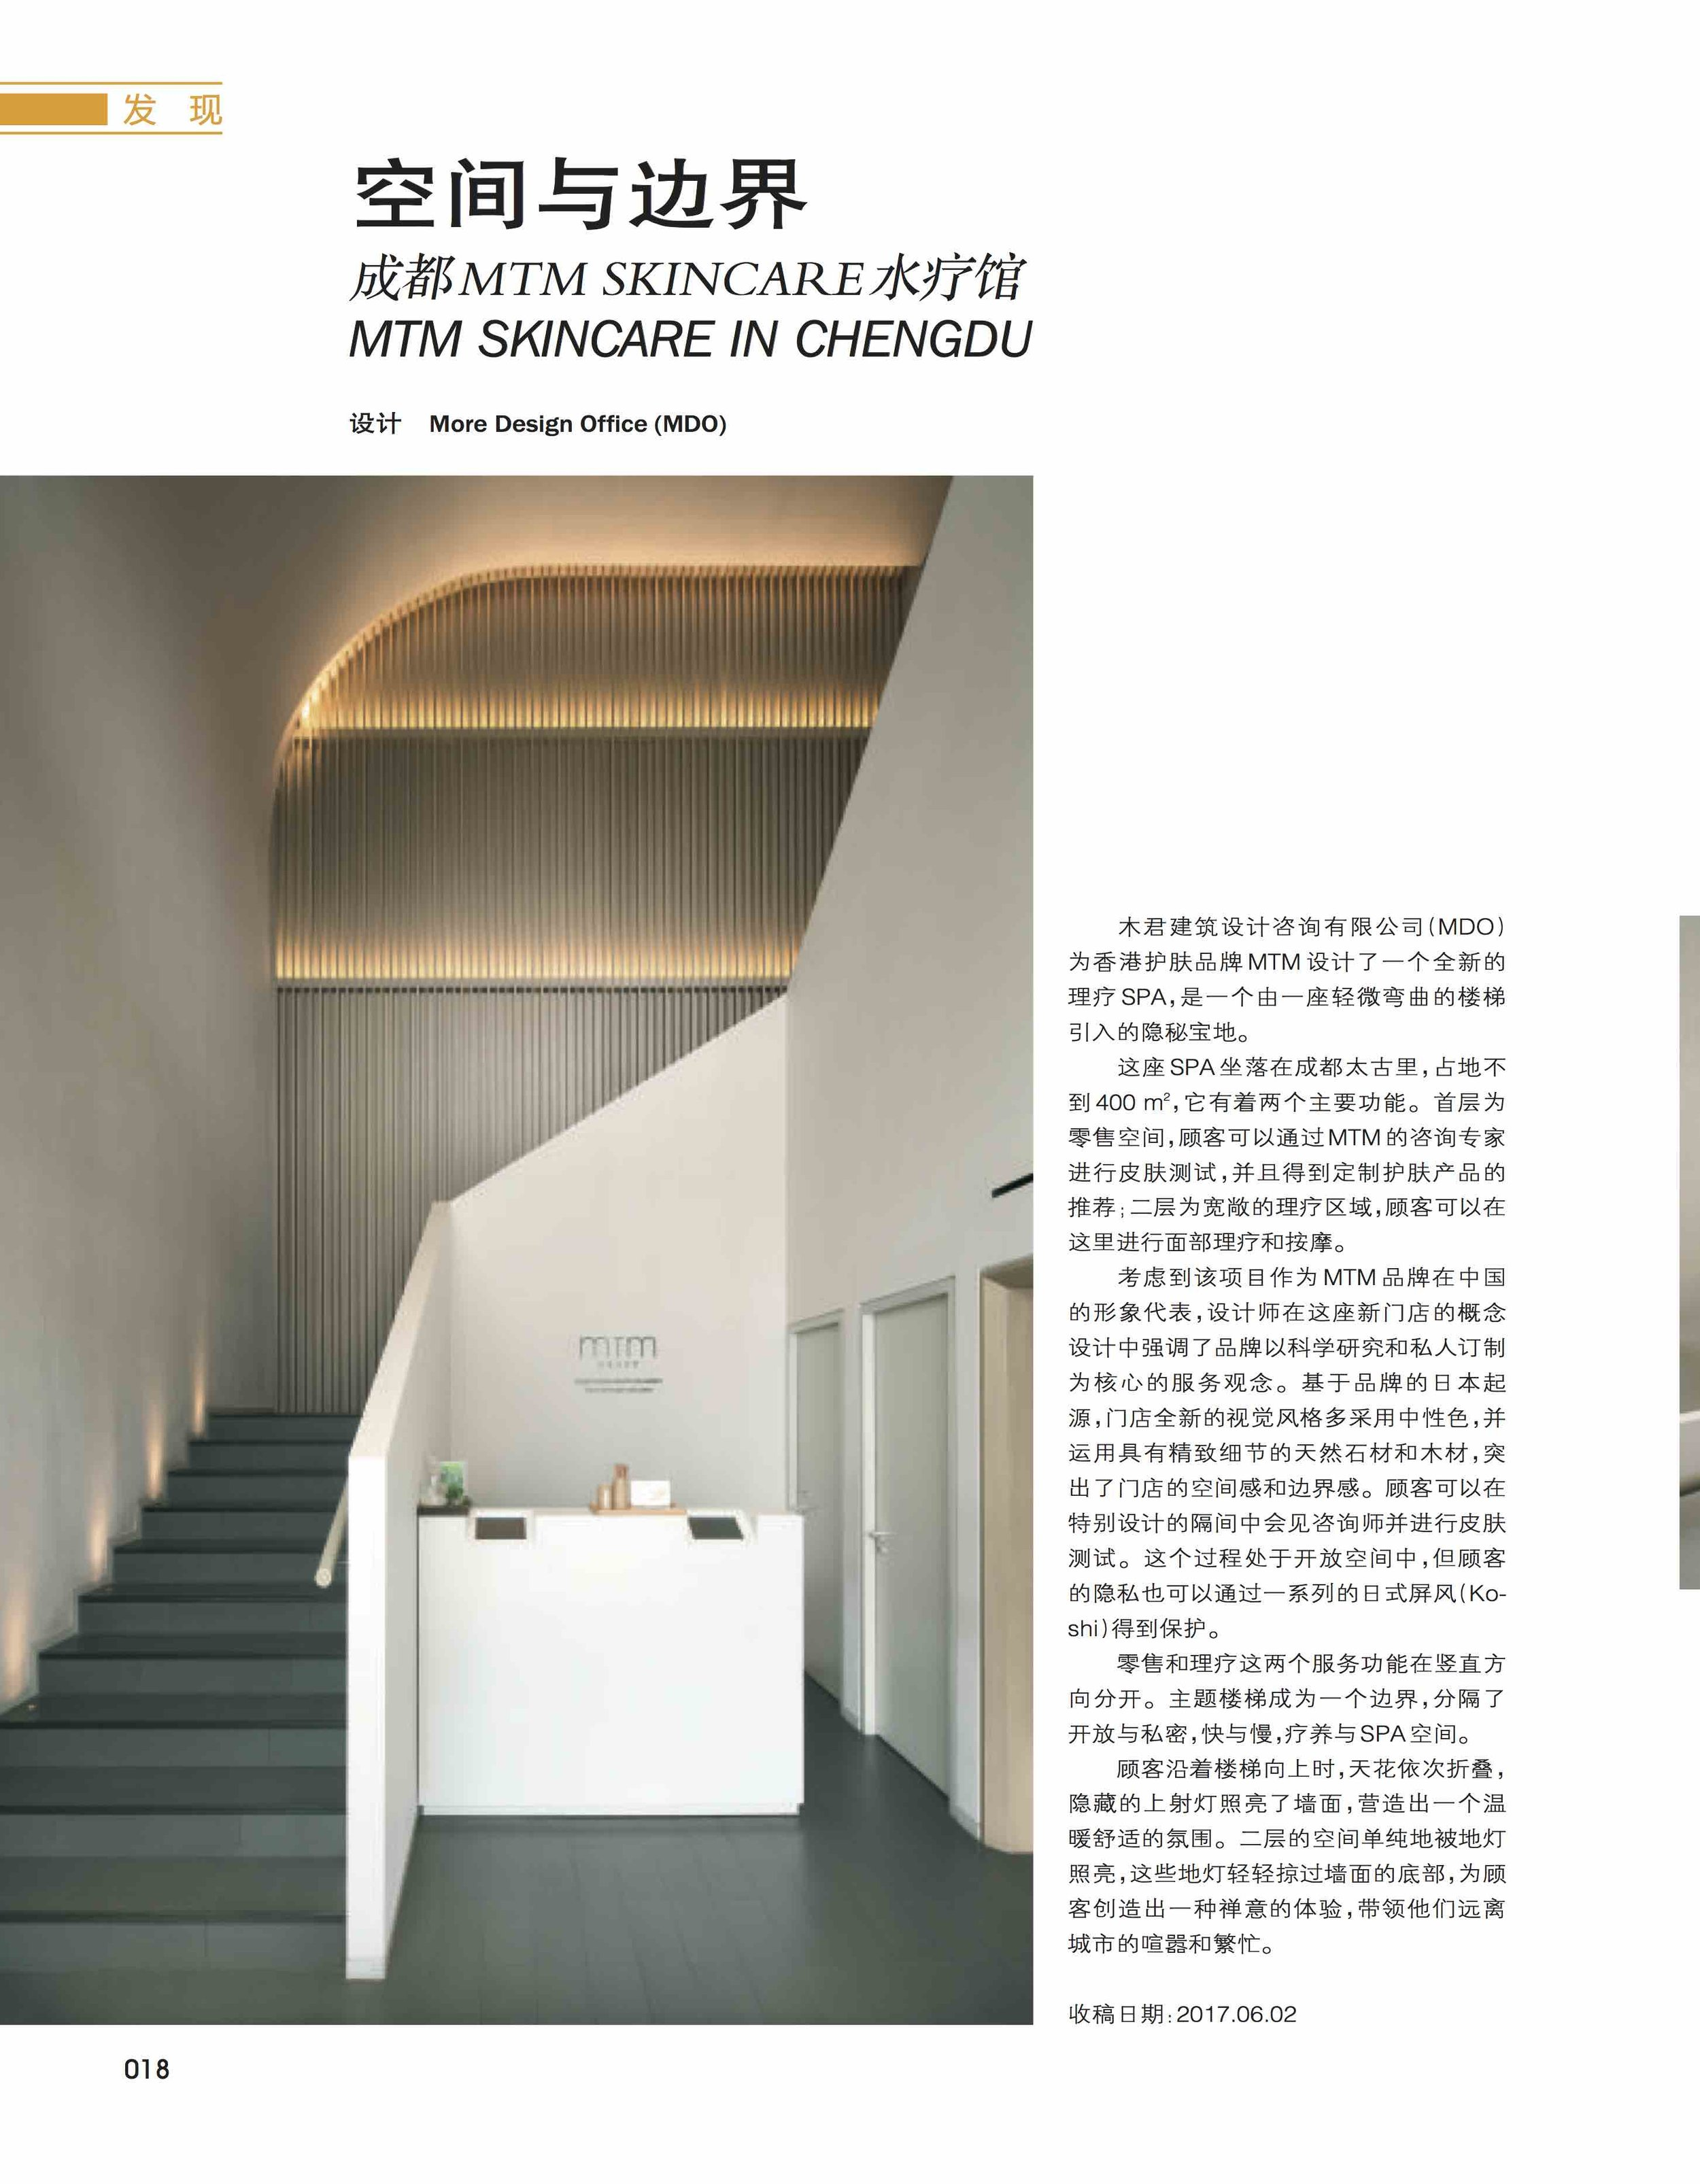 idc 201707_MTM Skincare Chengdu_1.jpg